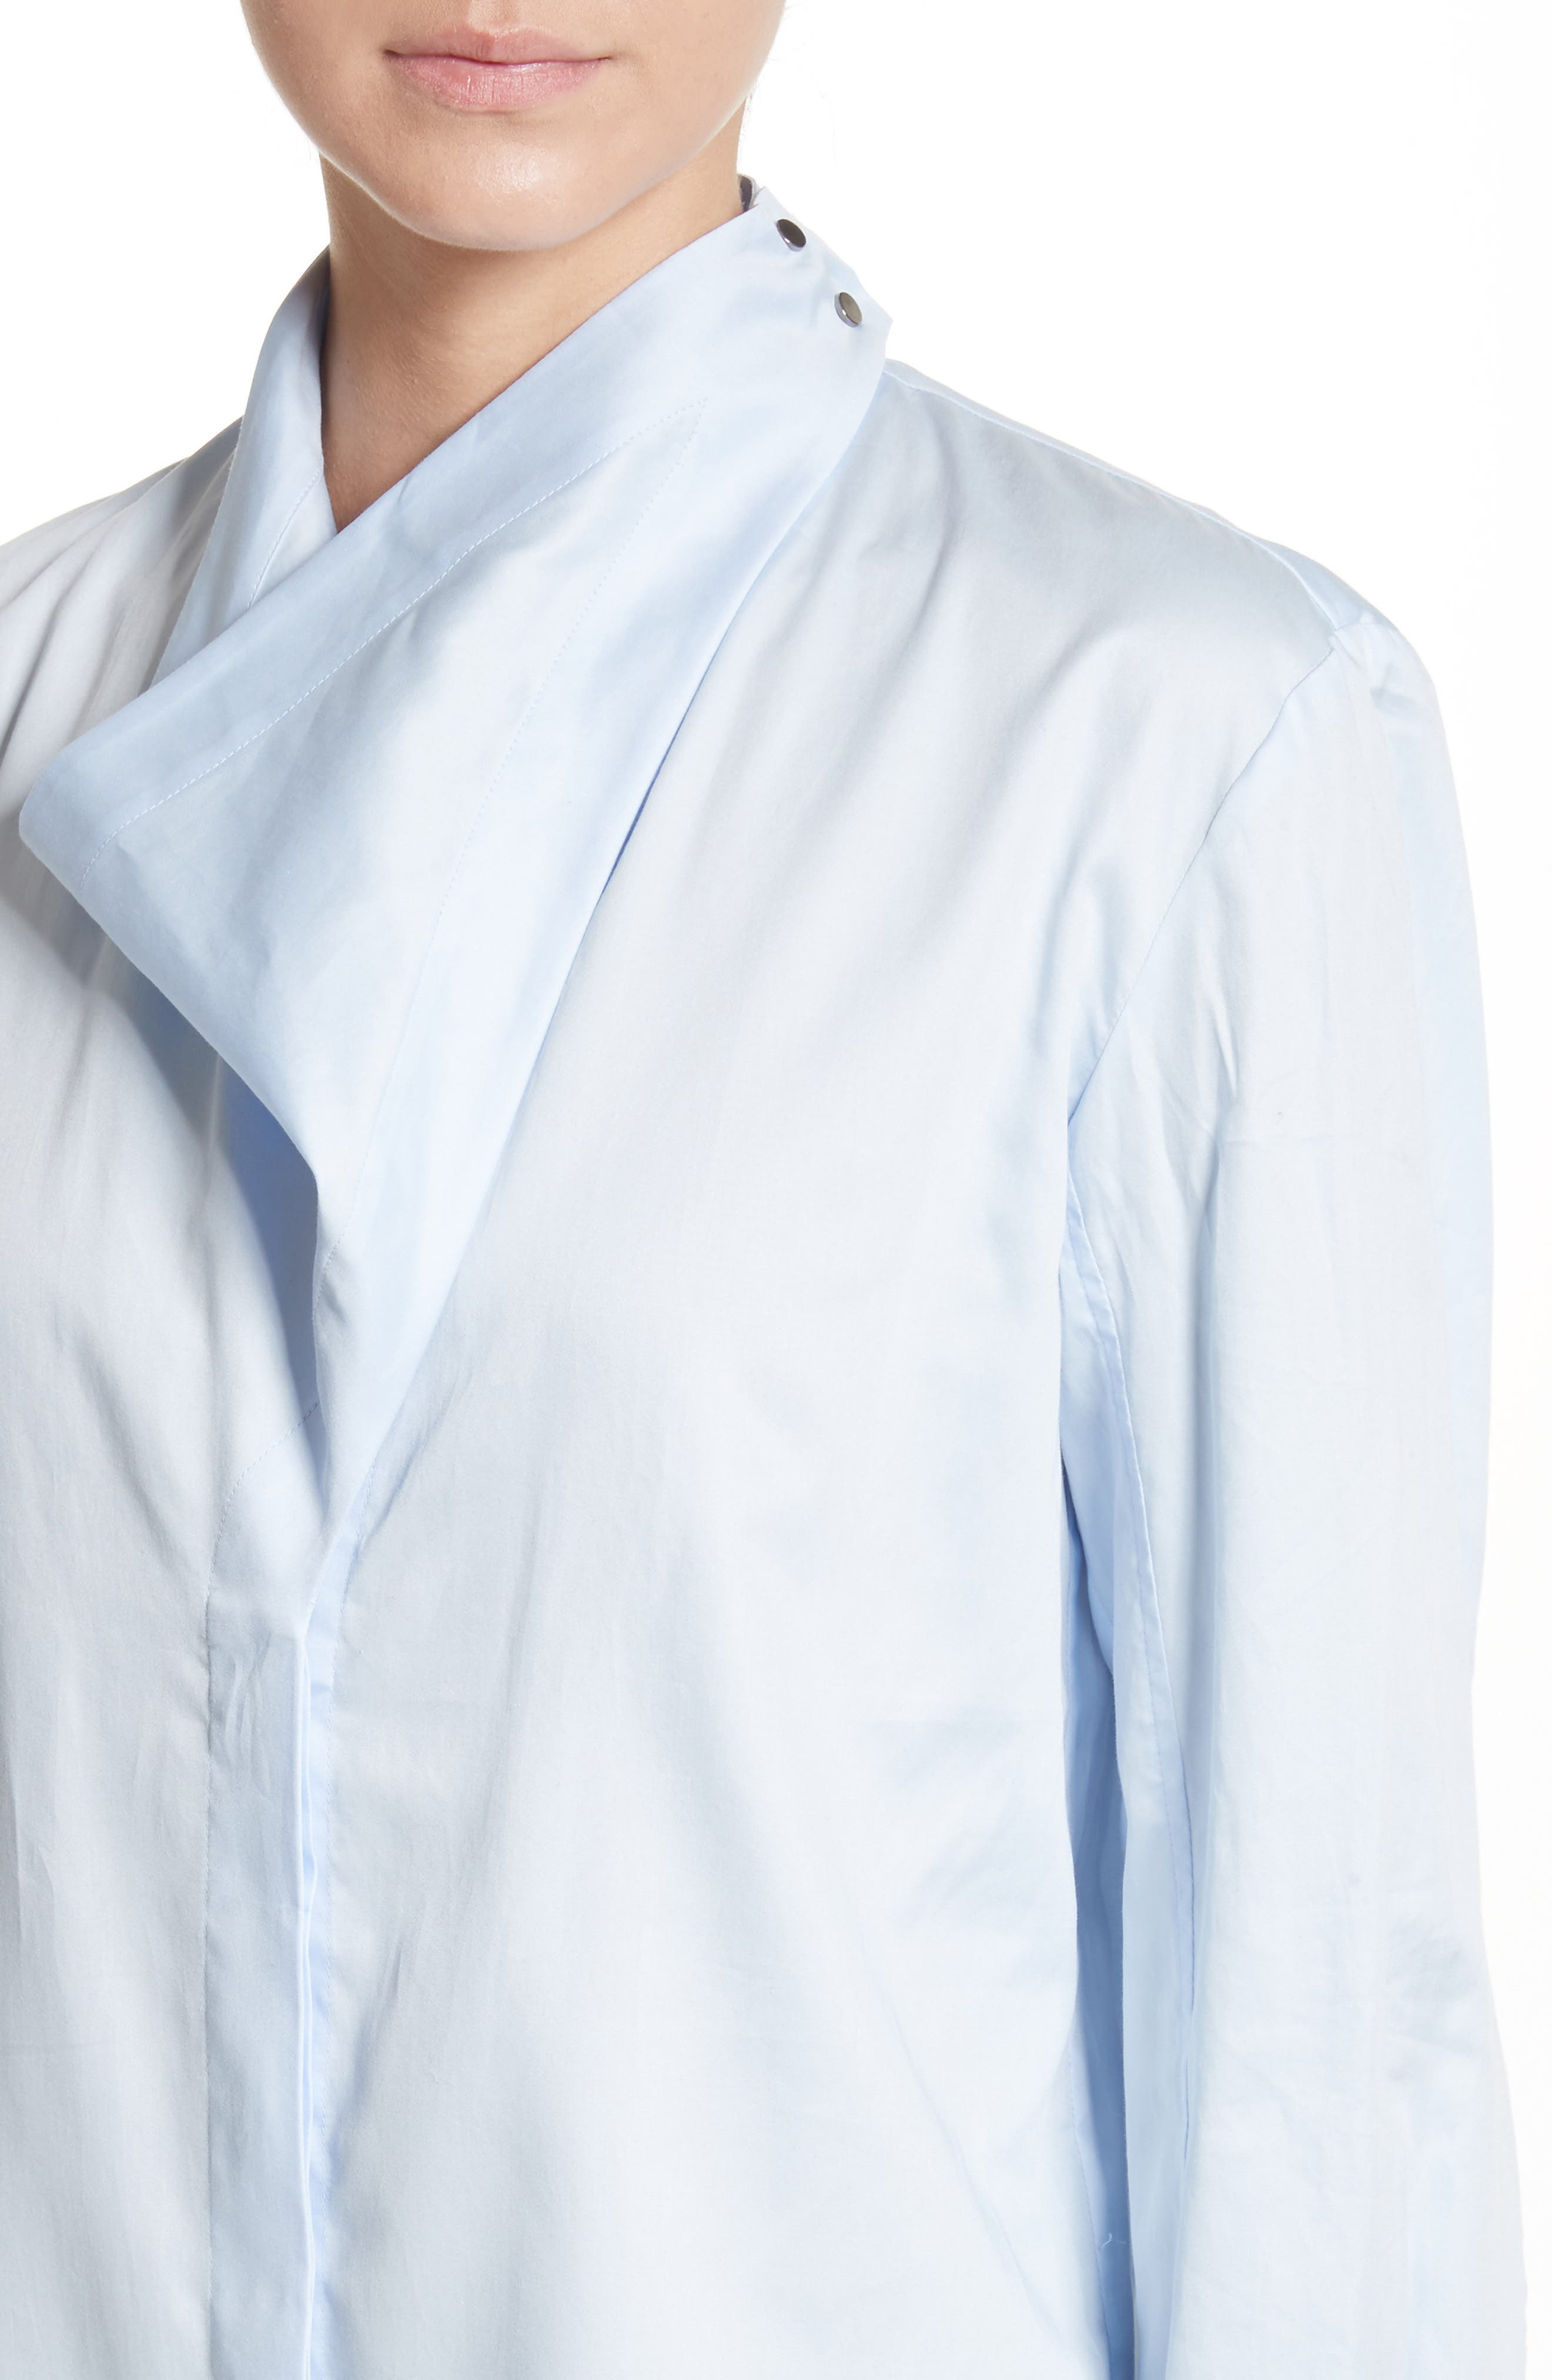 Damiane Cotton Poplin Shirt,                             Alternate thumbnail 4, color,